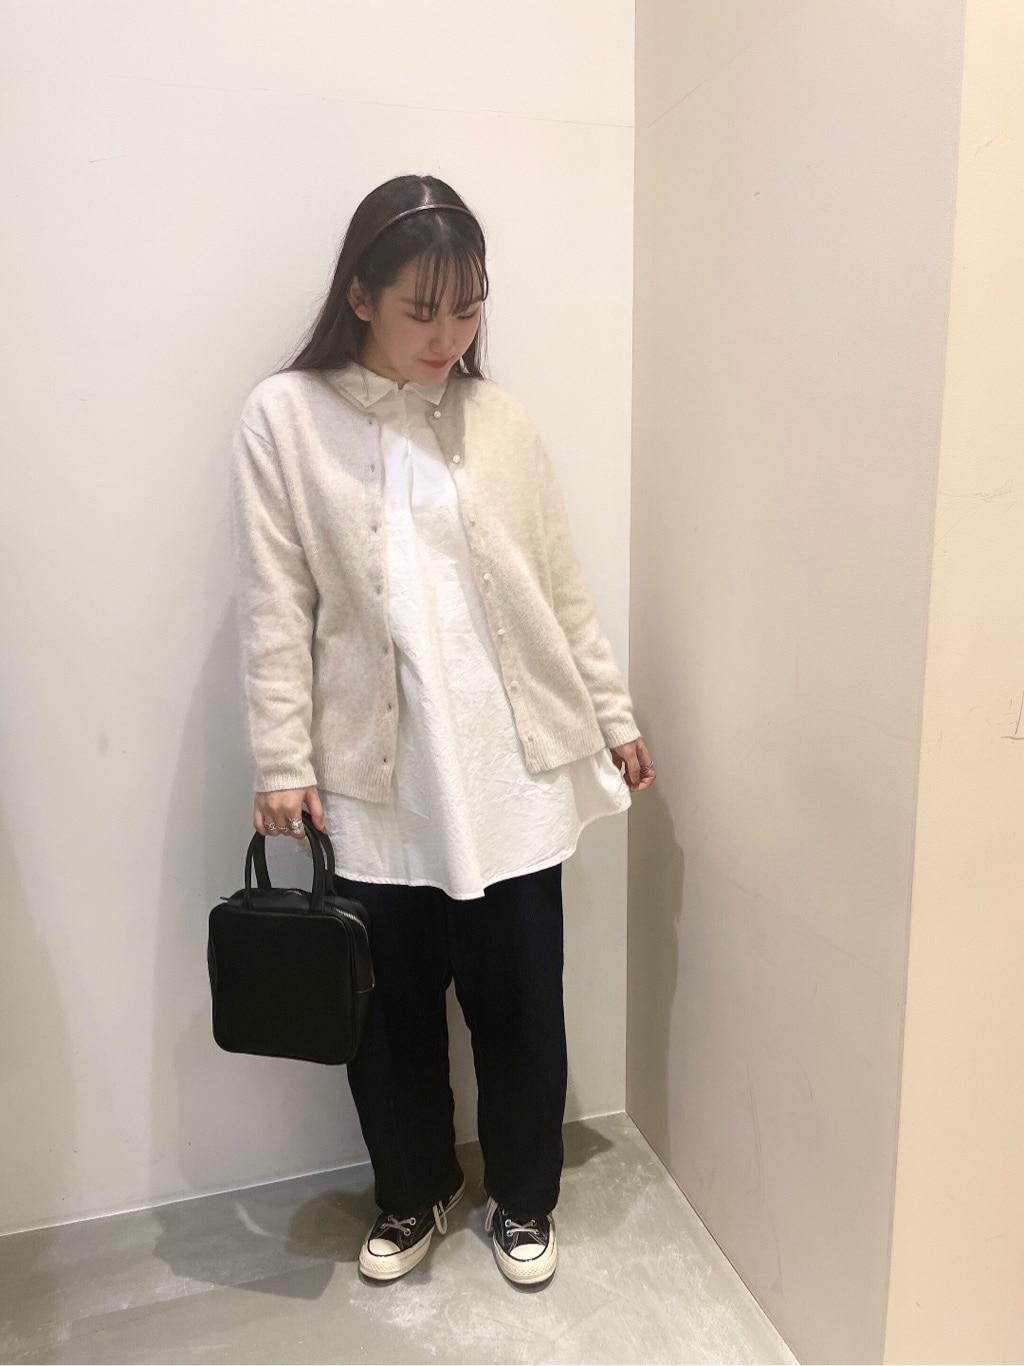 bulle de savon 阪急西宮ガーデンズ 身長:166cm 2020.12.21